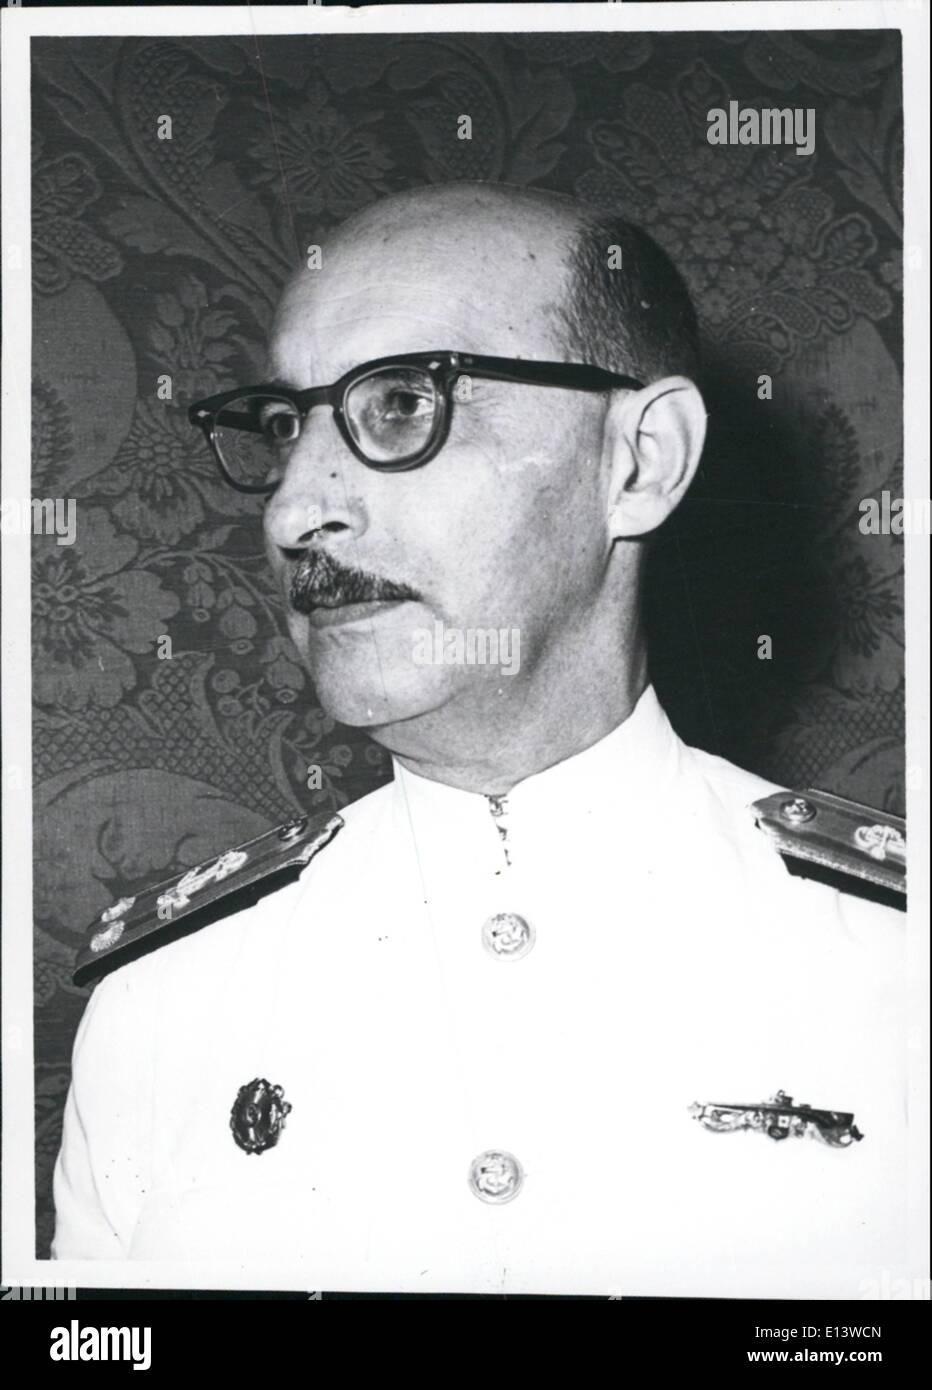 Mar. 27, 2012 - Vivienda C. Al. AP Luis E. Vargas Caballero. - Stock Image